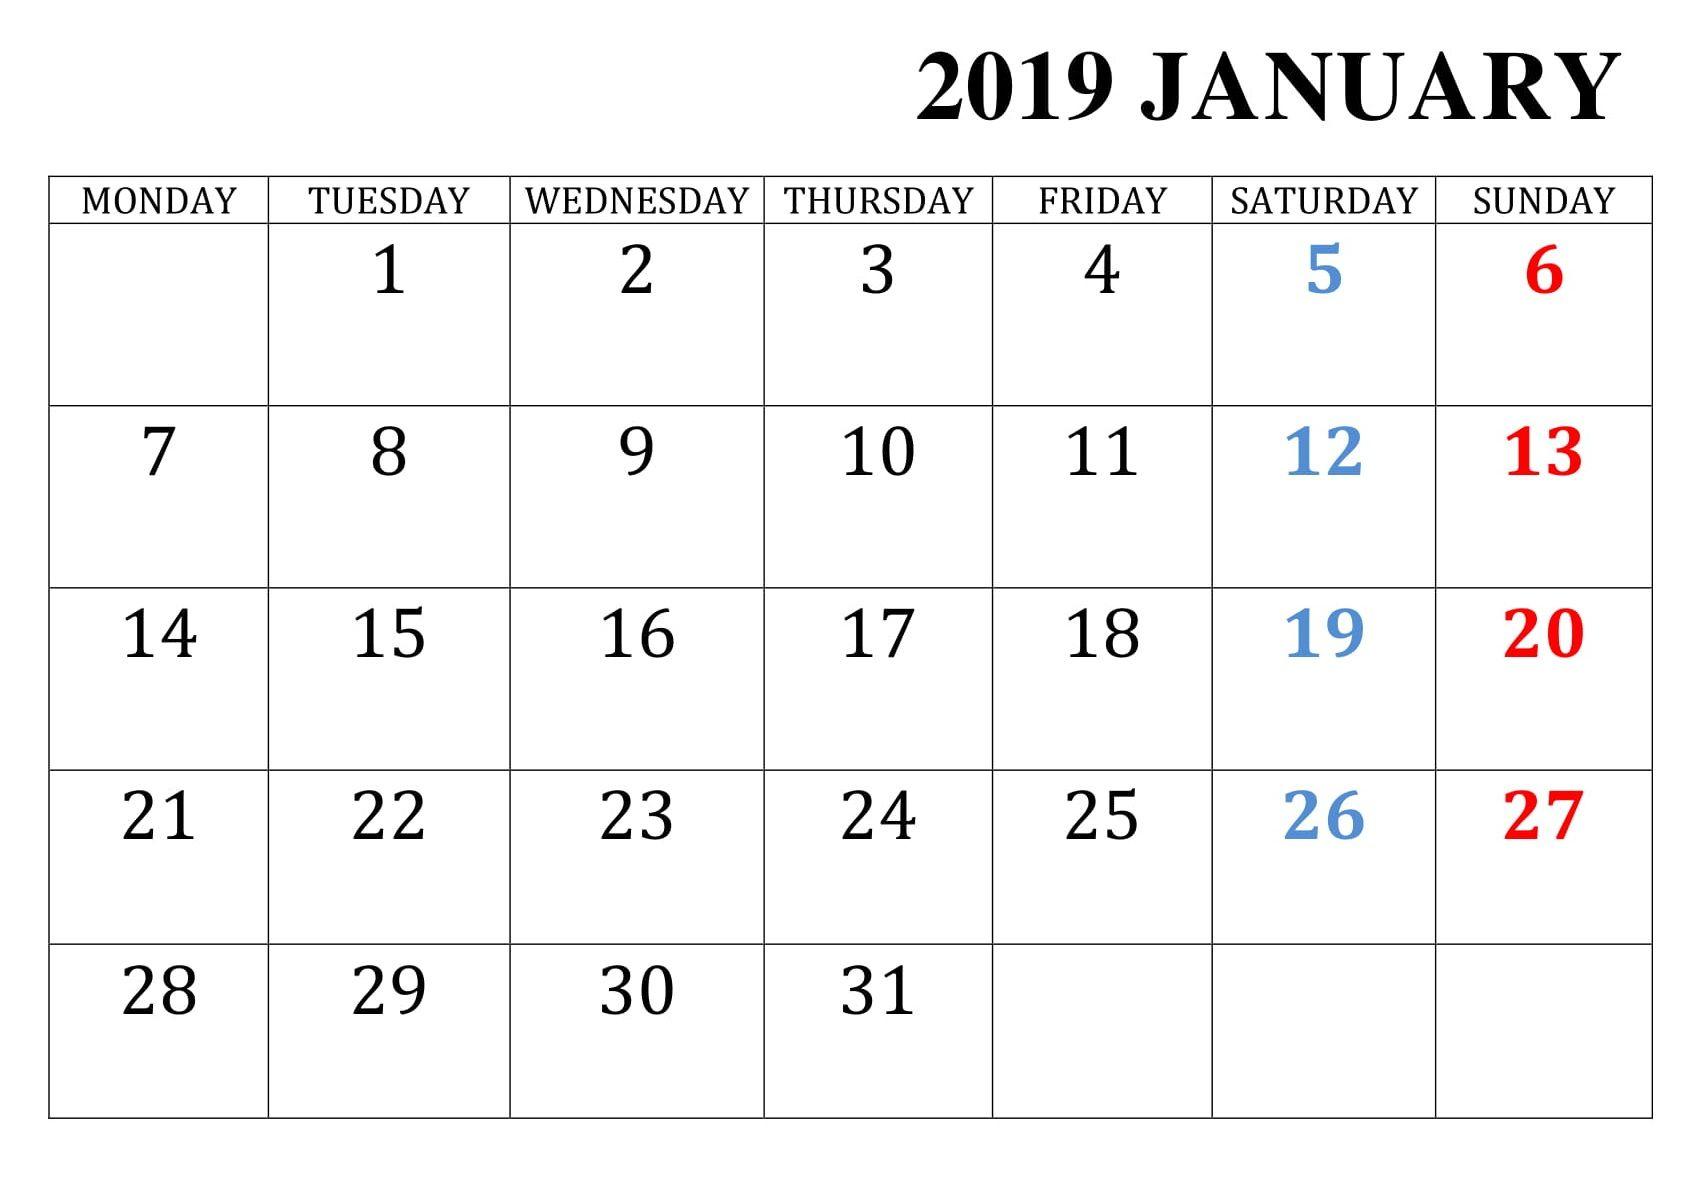 January 2019 Printable Calendar Calendar Printables June 2019